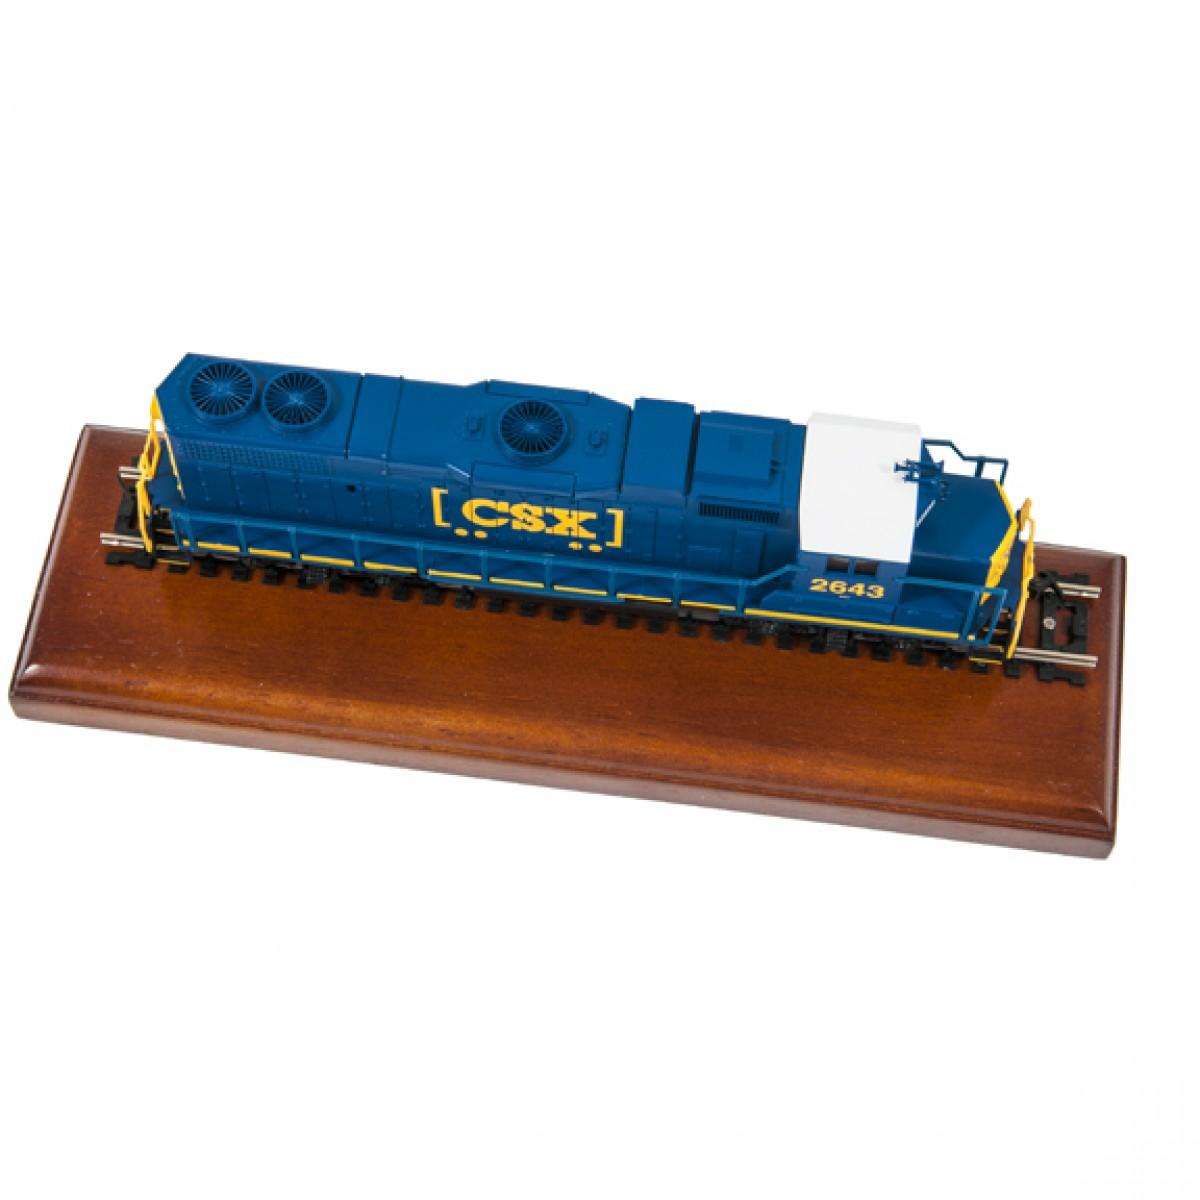 Csx How Tomorrow Moves Model Train